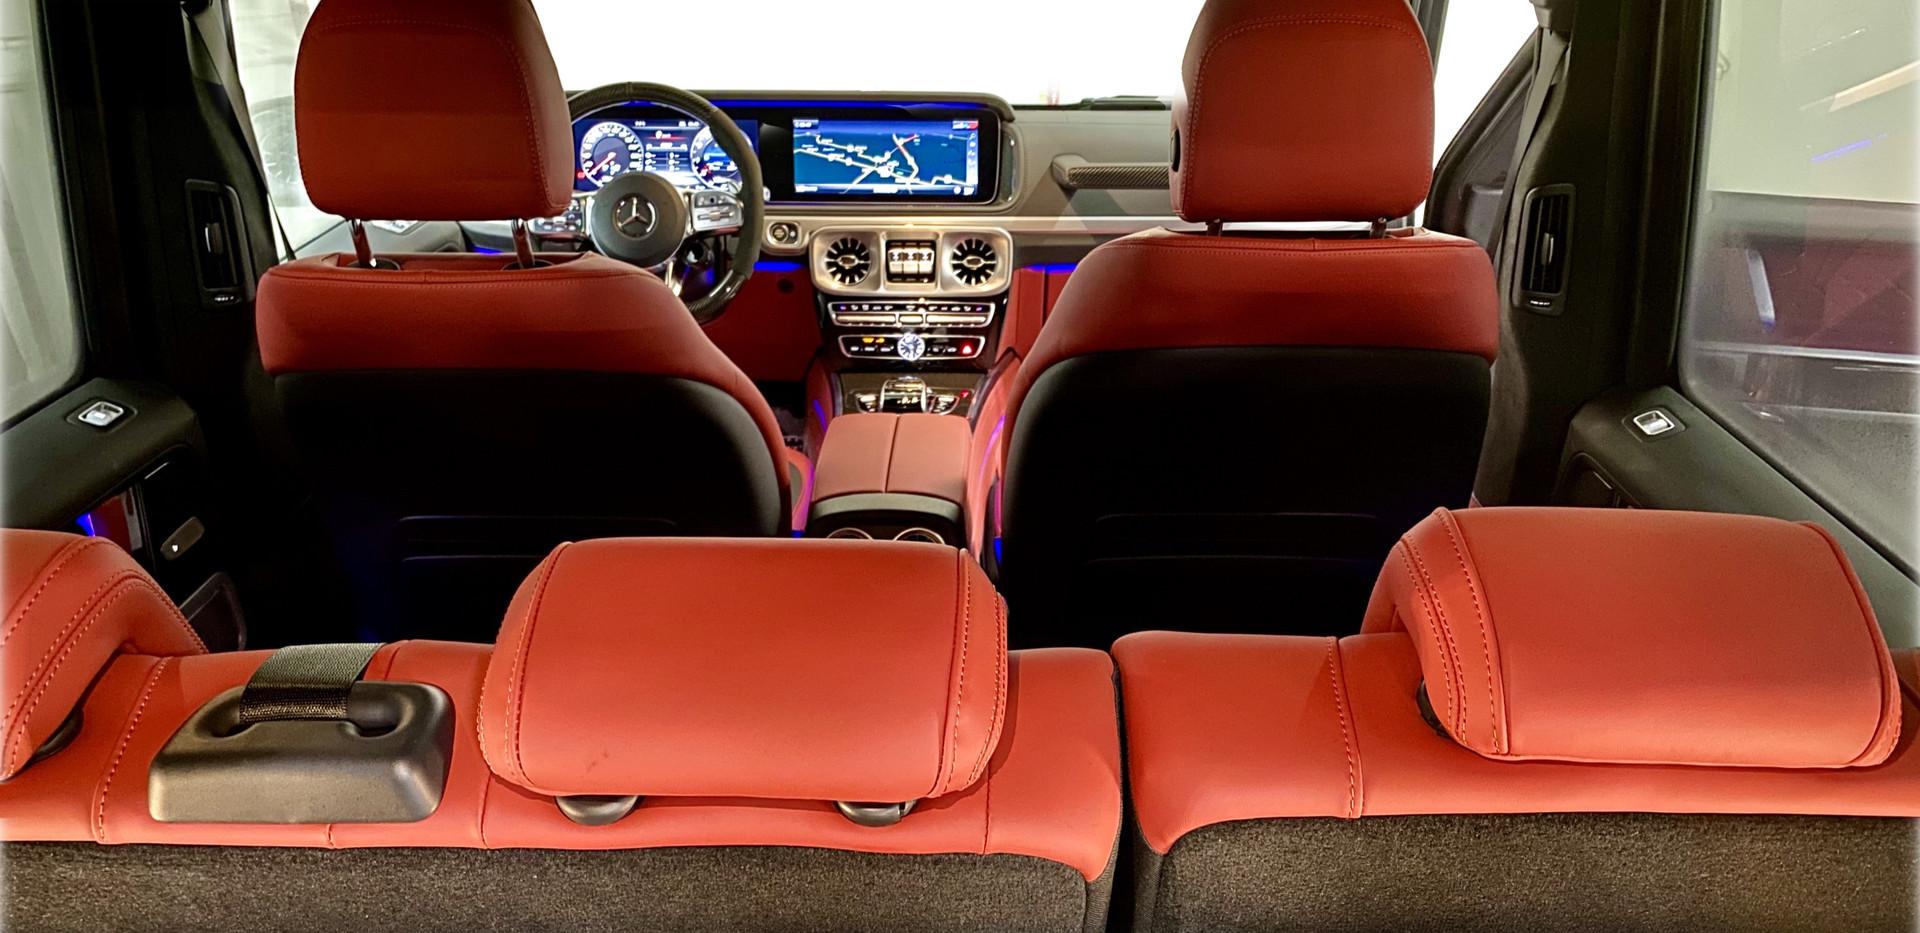 G63 Rear Passenger Compartment